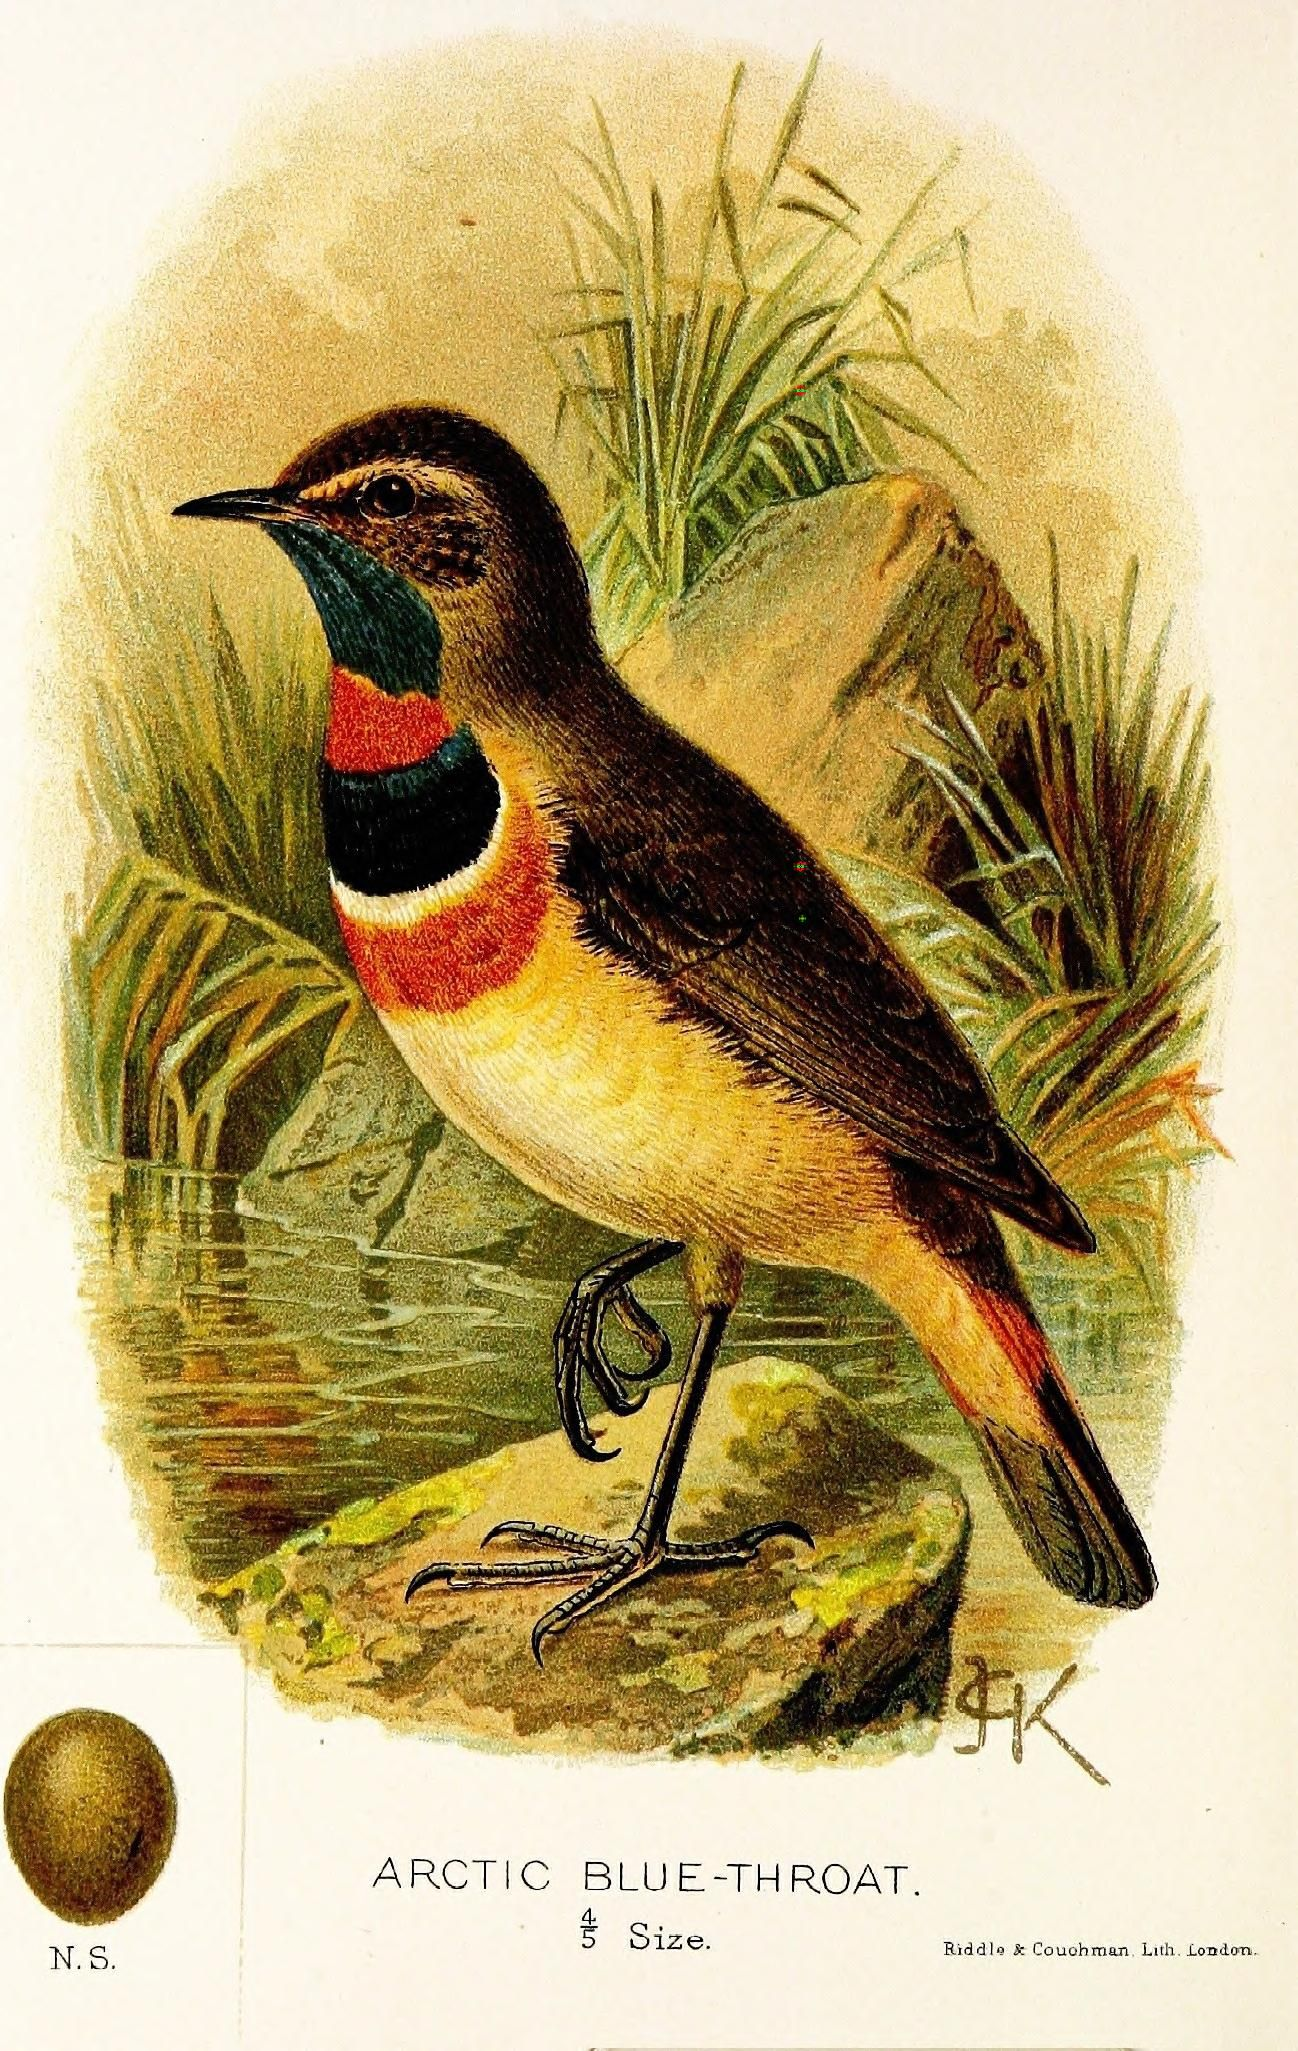 Un capítulo sobre las aves raras británicos Por Sharpe, Richard Bowdler s. por javier magdaleno